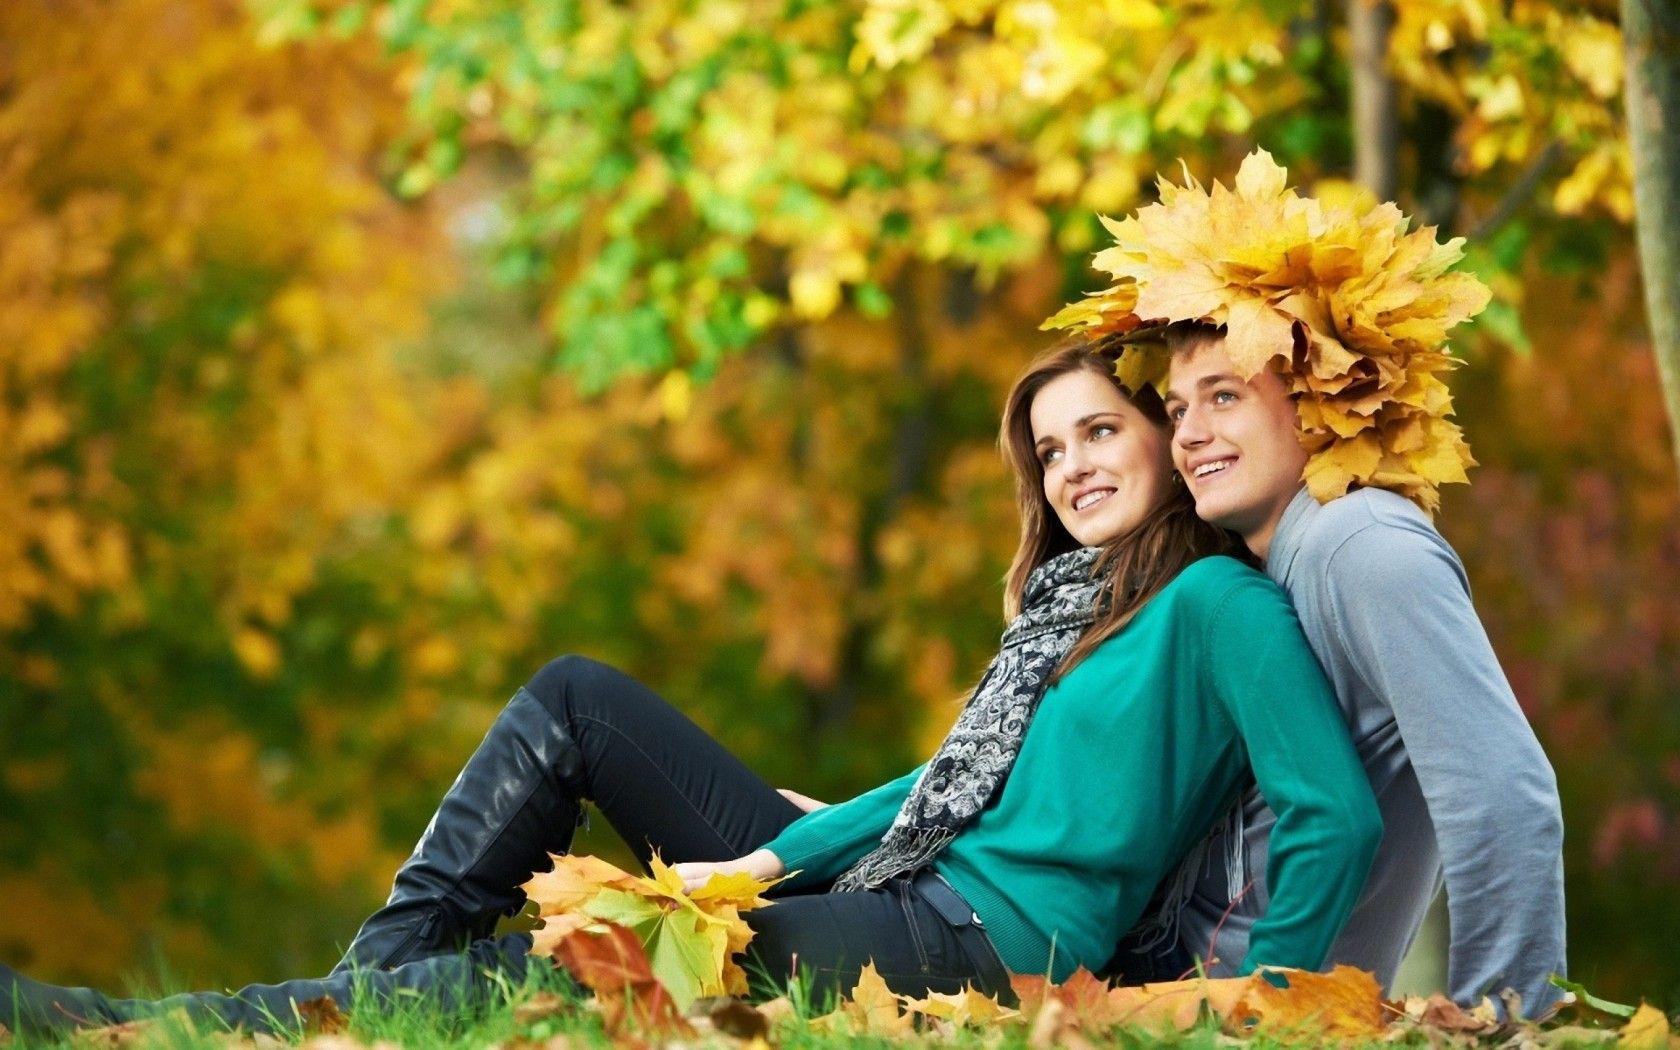 Most Inspiring Wallpaper High Quality Romantic - 46350595b8eba761c3fdc84777e7588d  Snapshot_973530.jpg